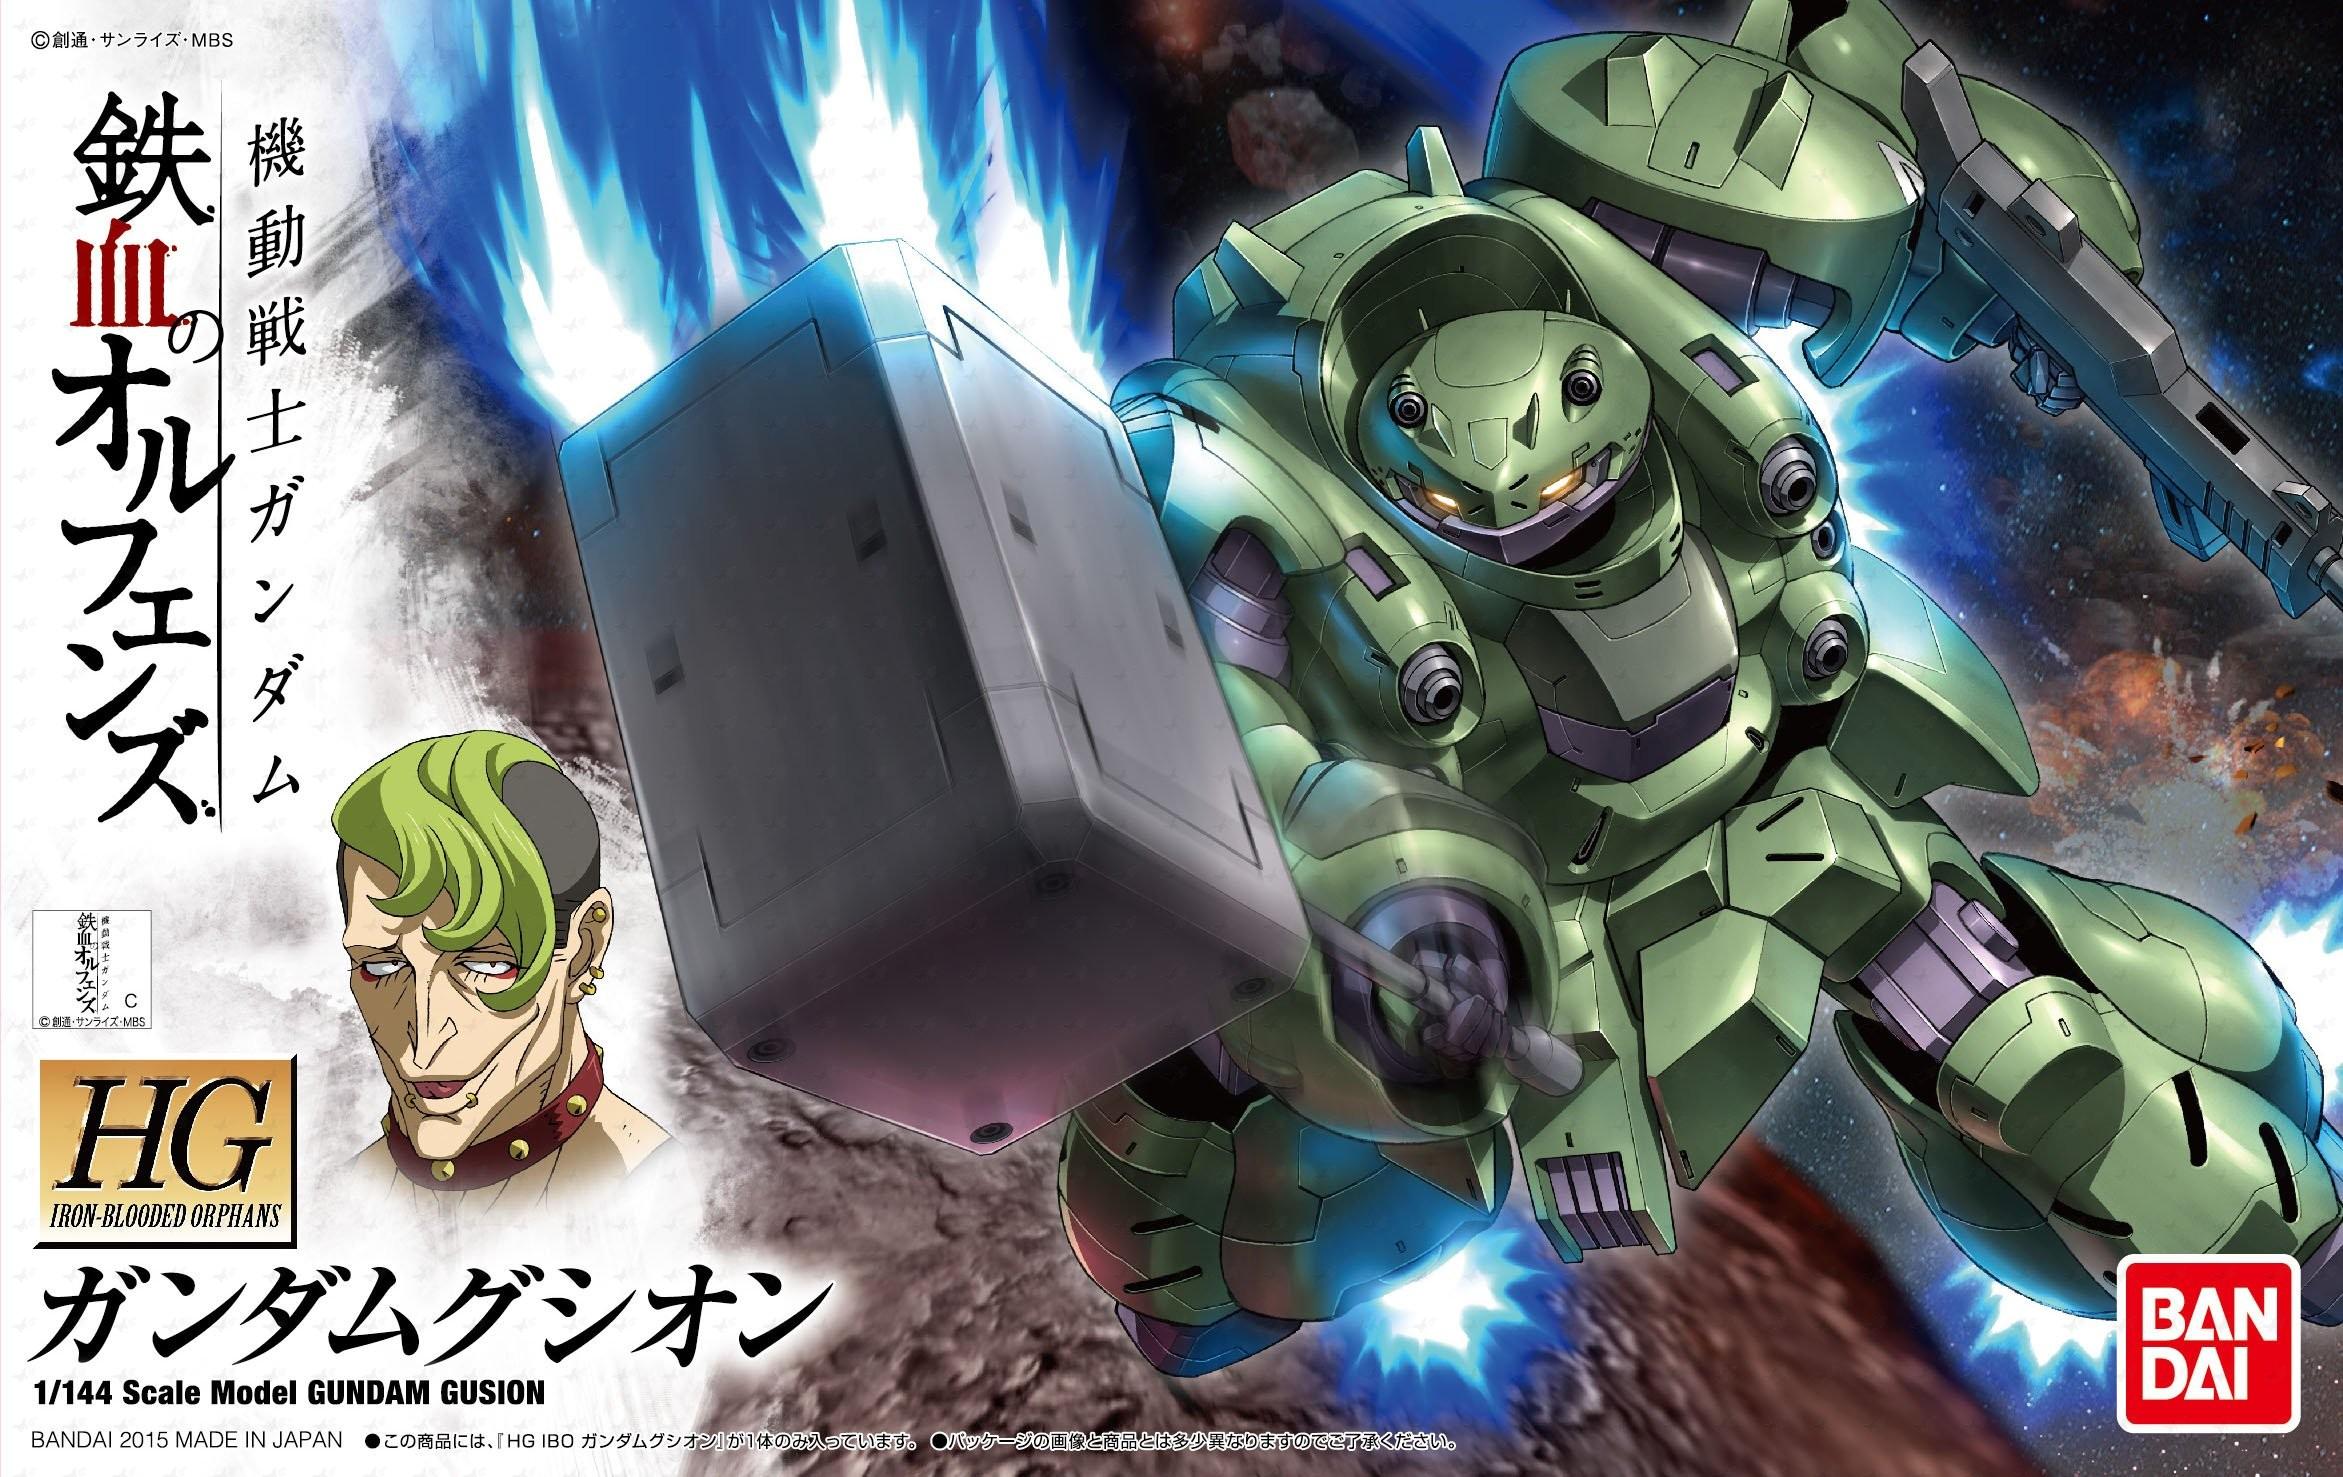 HG 1/144 ASW-G-11 ガンダムグシオン [Gundam Gusion] 0201878